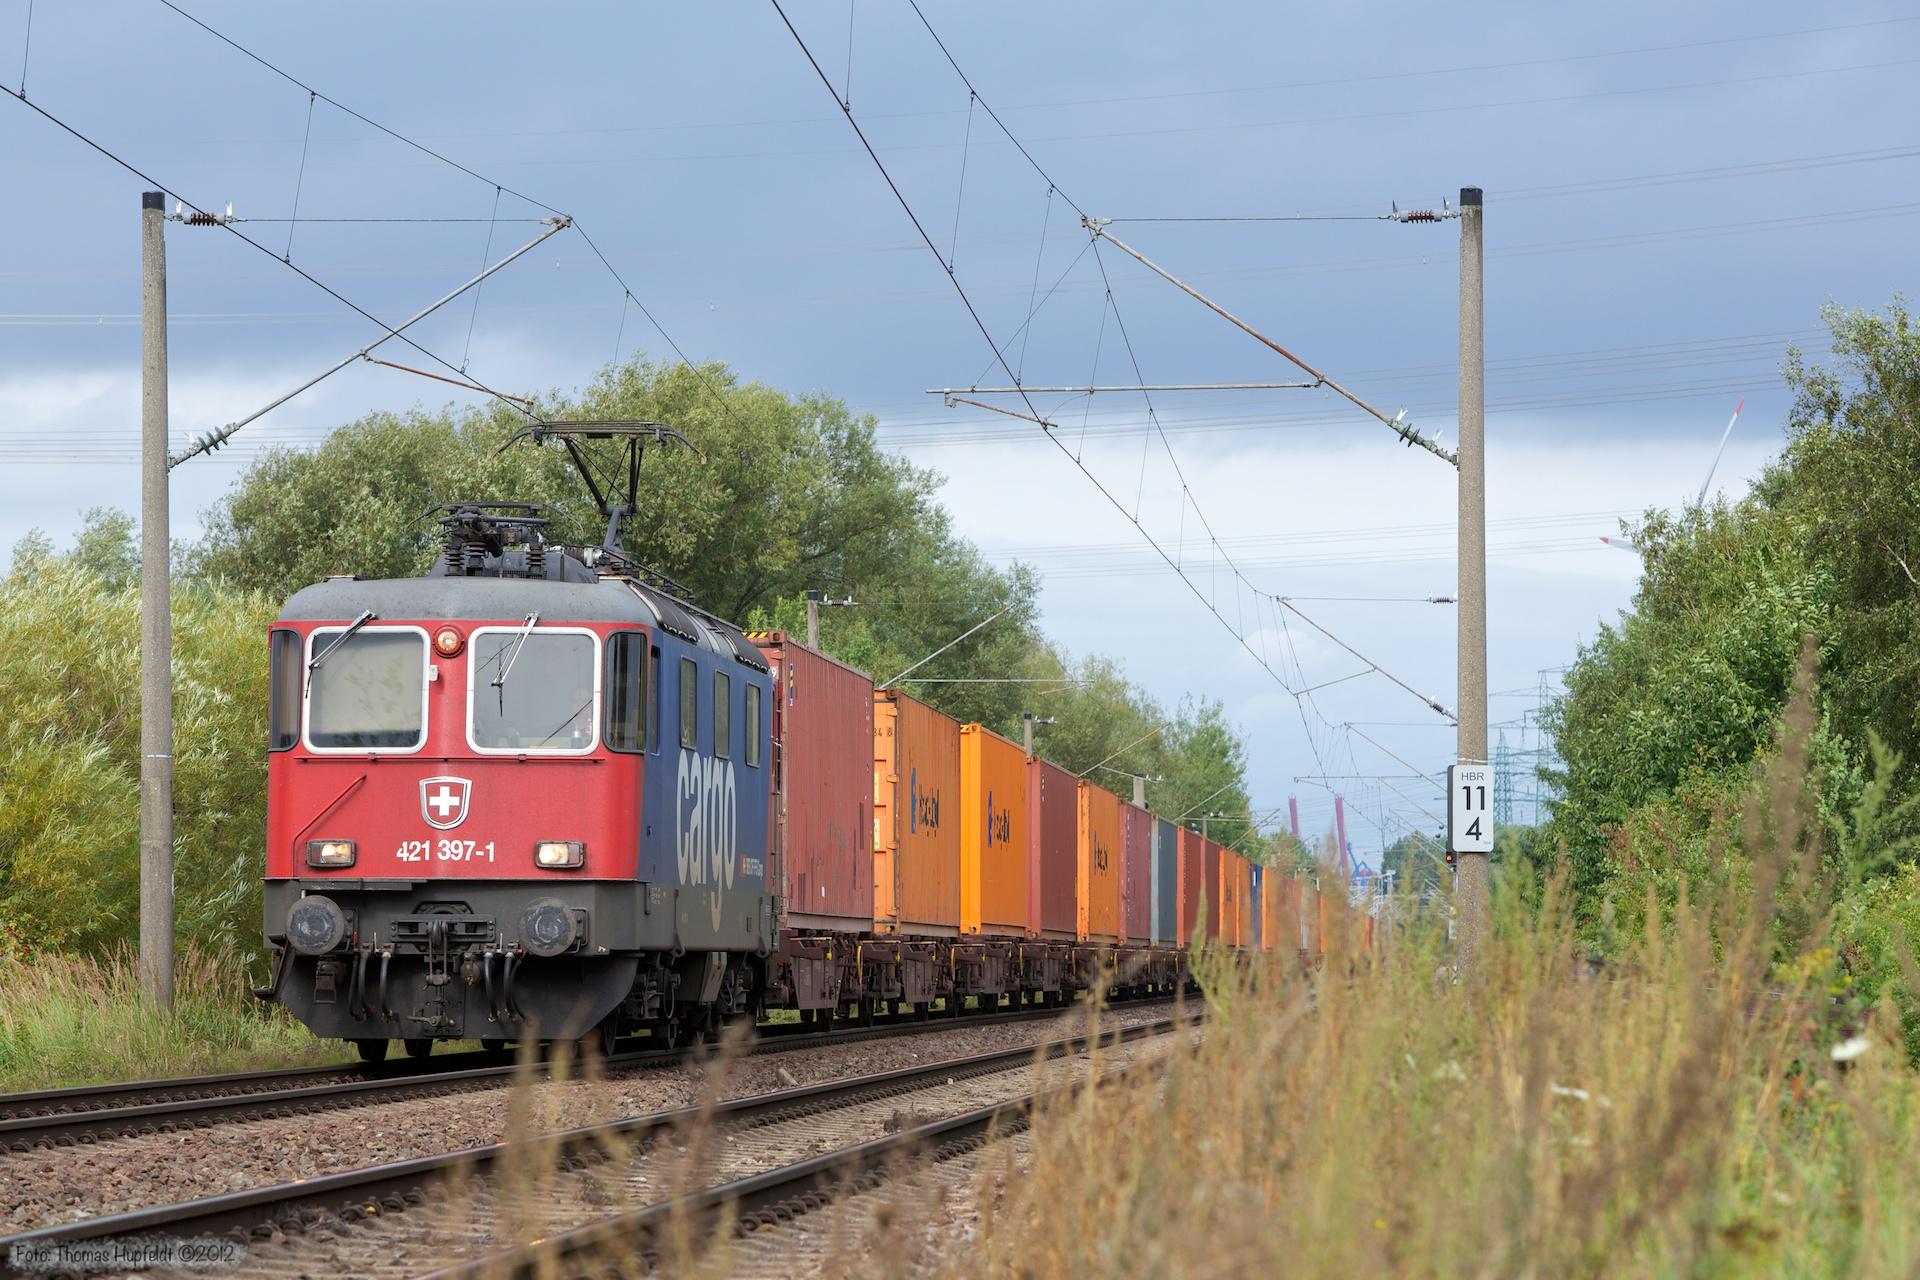 SBB Cargo Re 421 397-1 ved Hamburg Moorburg - 15.09.2012